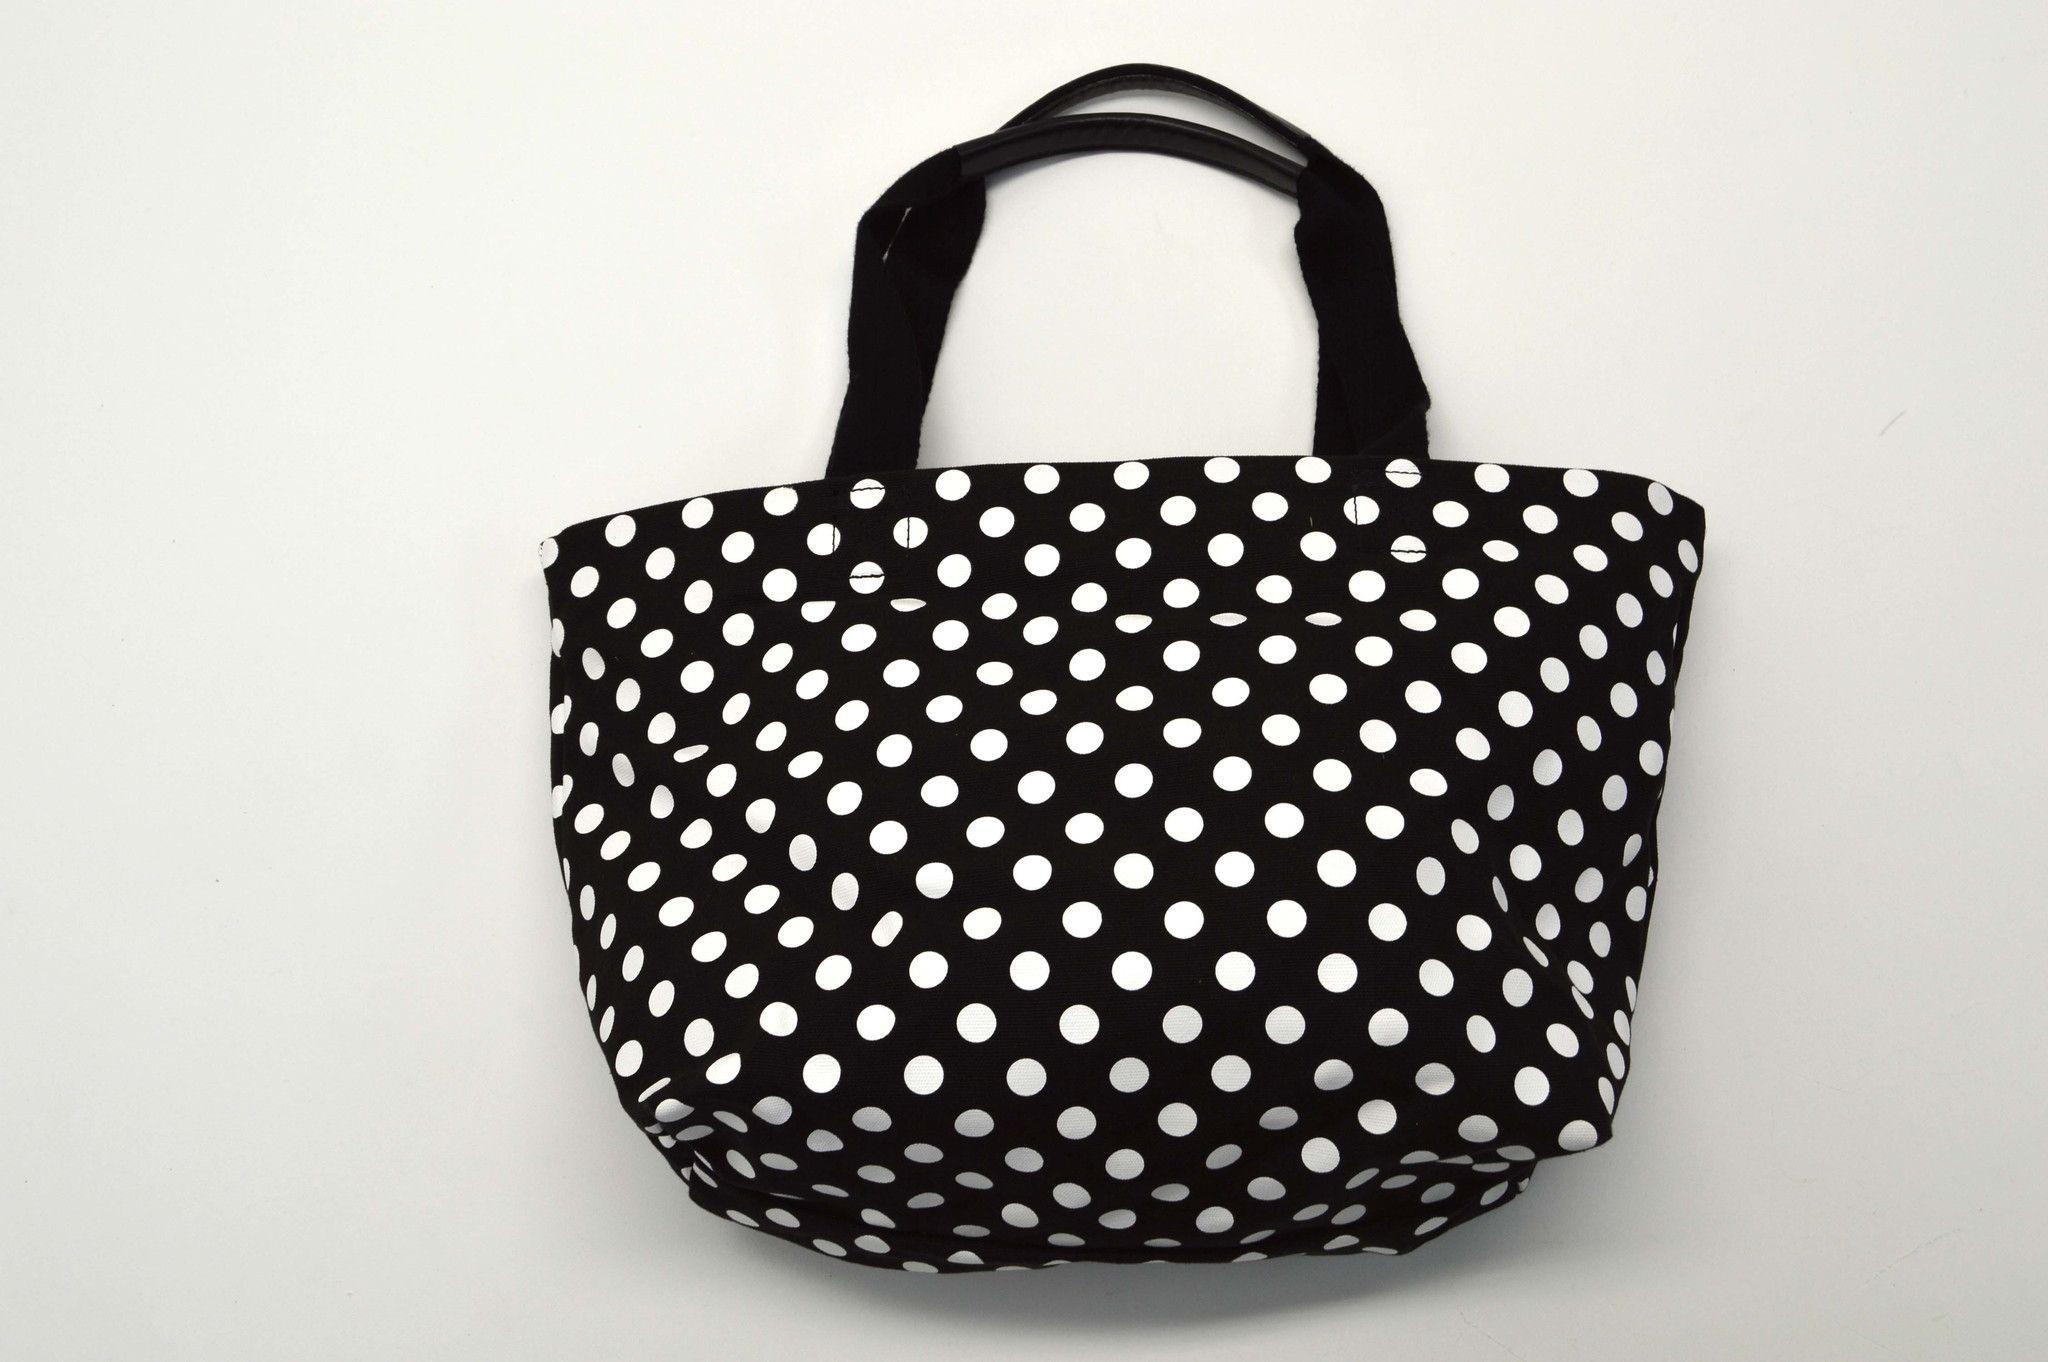 Kate Spade New York Pink Rose Reusable Tote Bag (No Dust bag)